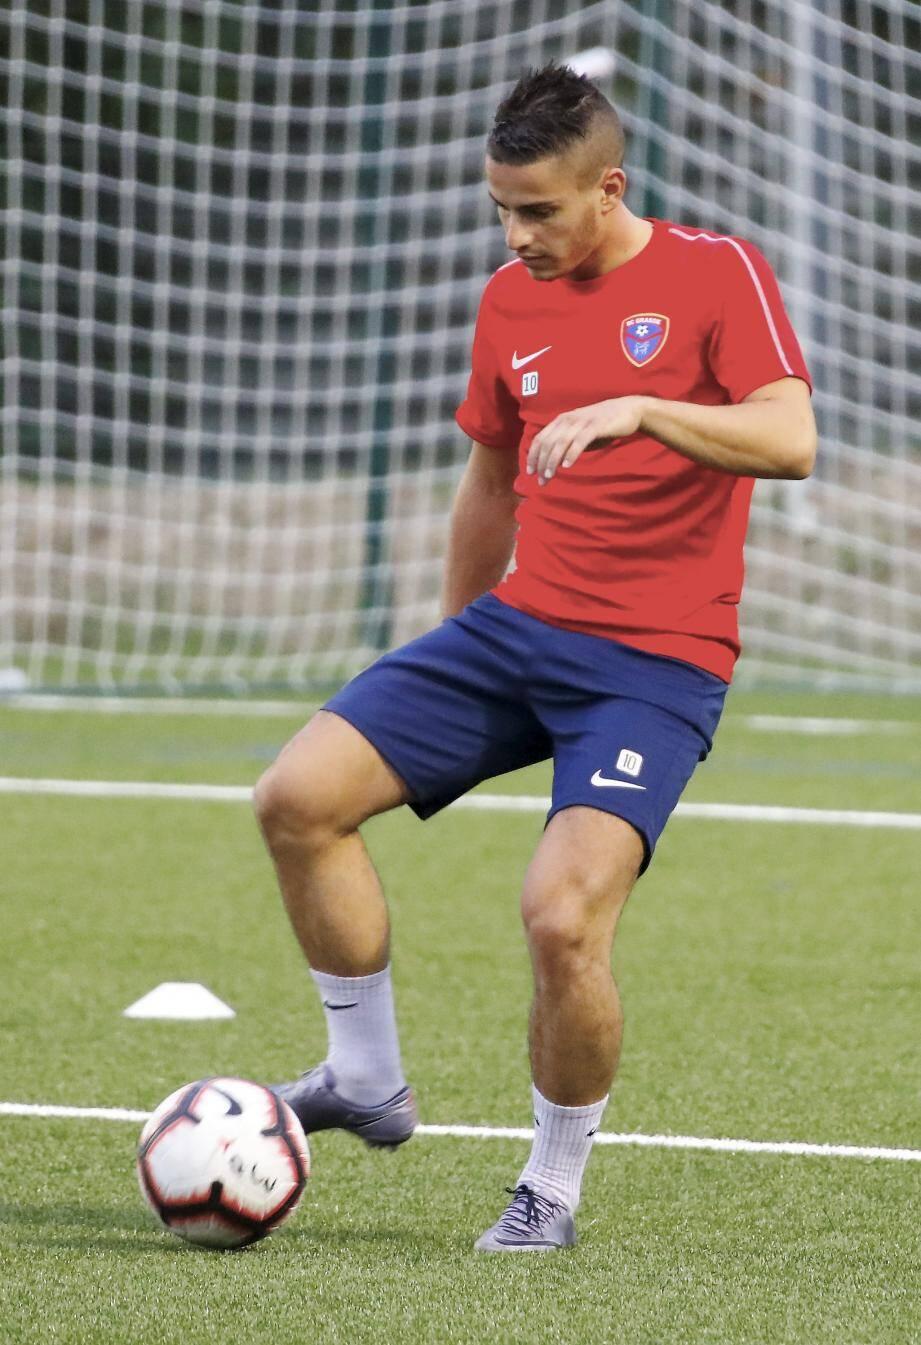 Loïc Malatini, mercredi, à l'entraînement. Ce soir, il sera enfin de retour sur les terrains..